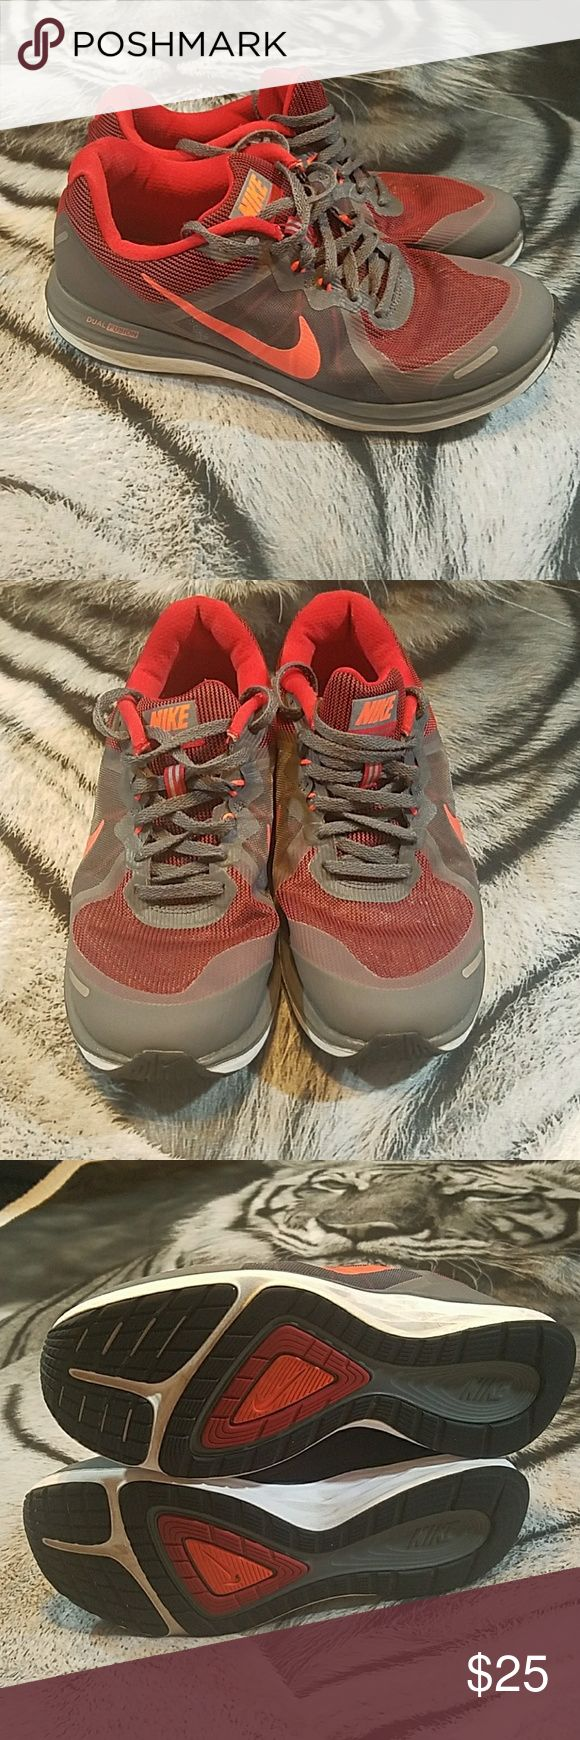 Nike dual fusion x2 shoes Men's nike dual fusion x3 in great condition worn a couple times no box as men's size 9 Nike Shoes